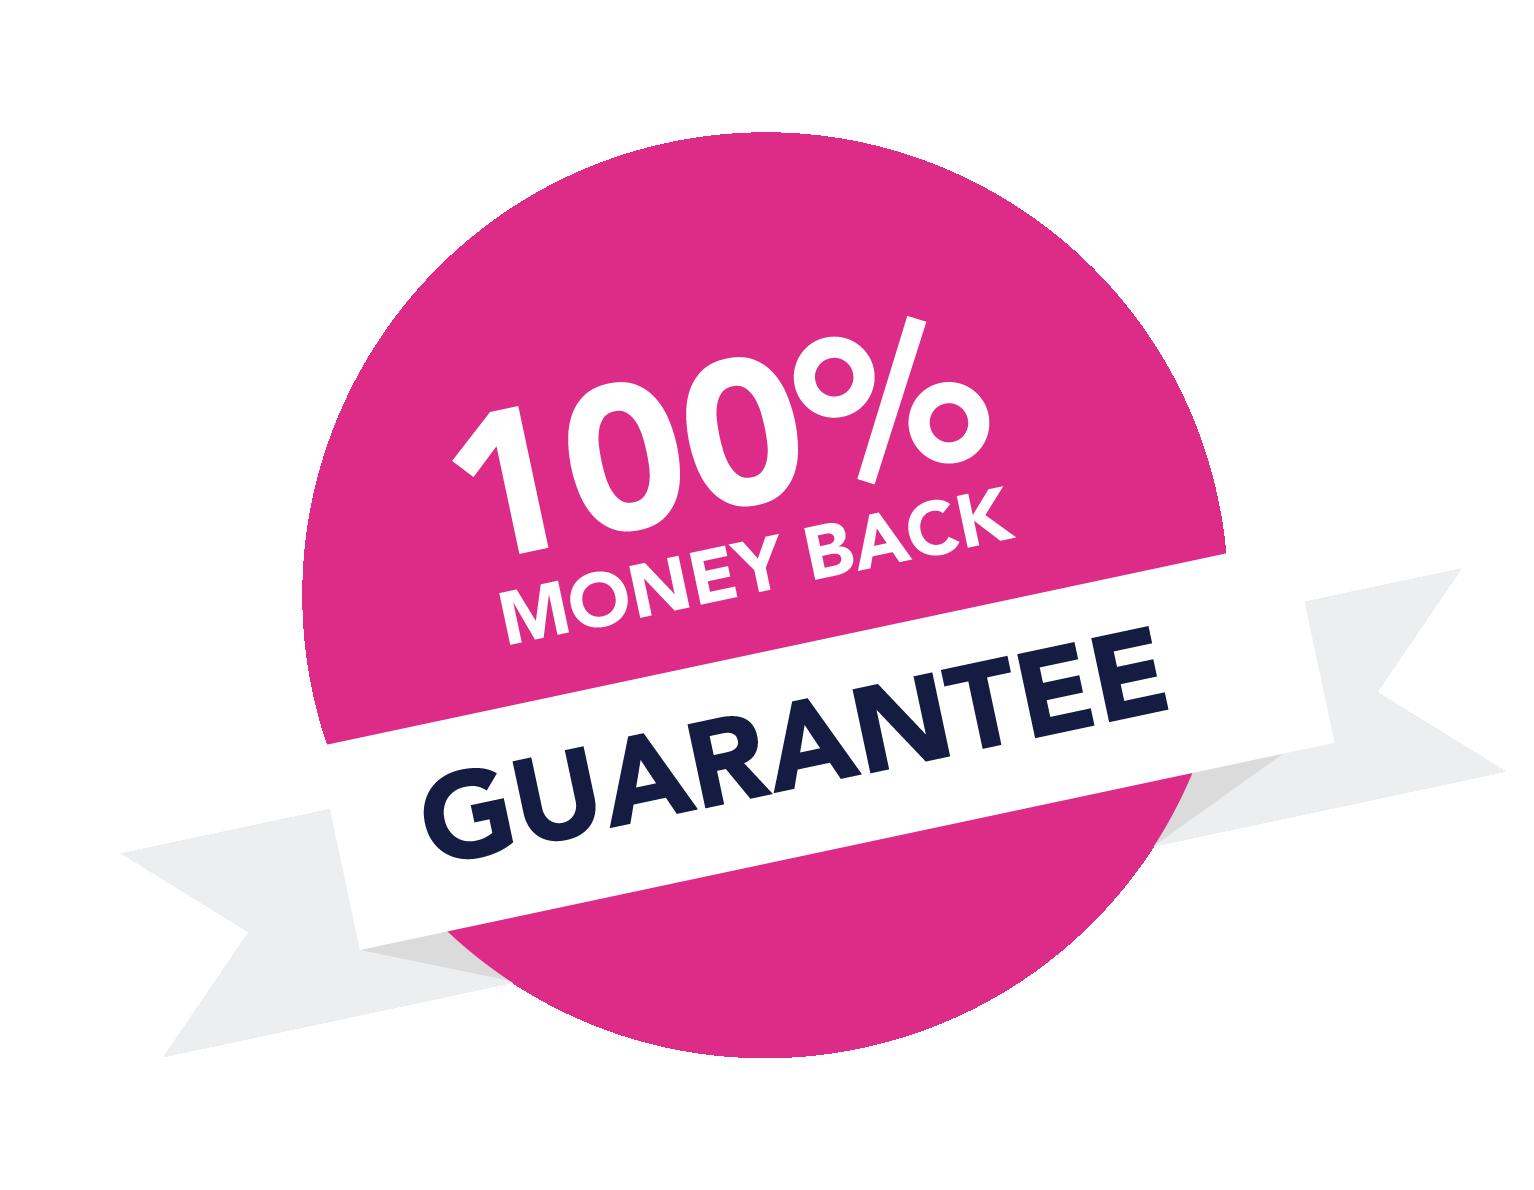 100% Money back guarantee sticker